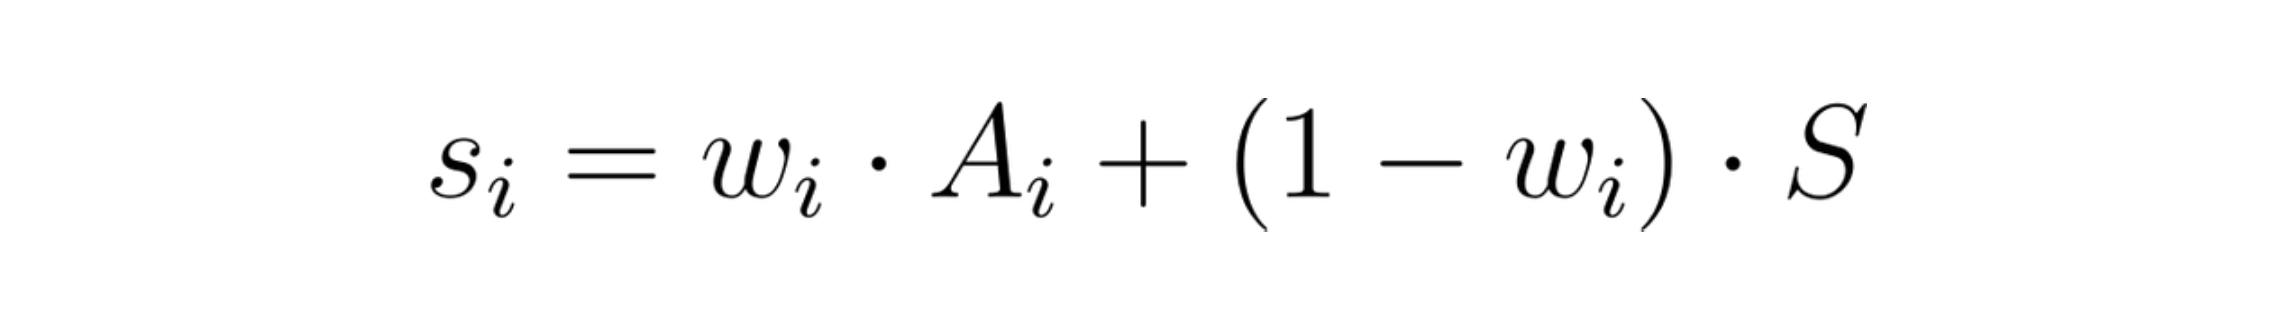 bayesian average formula for rating system